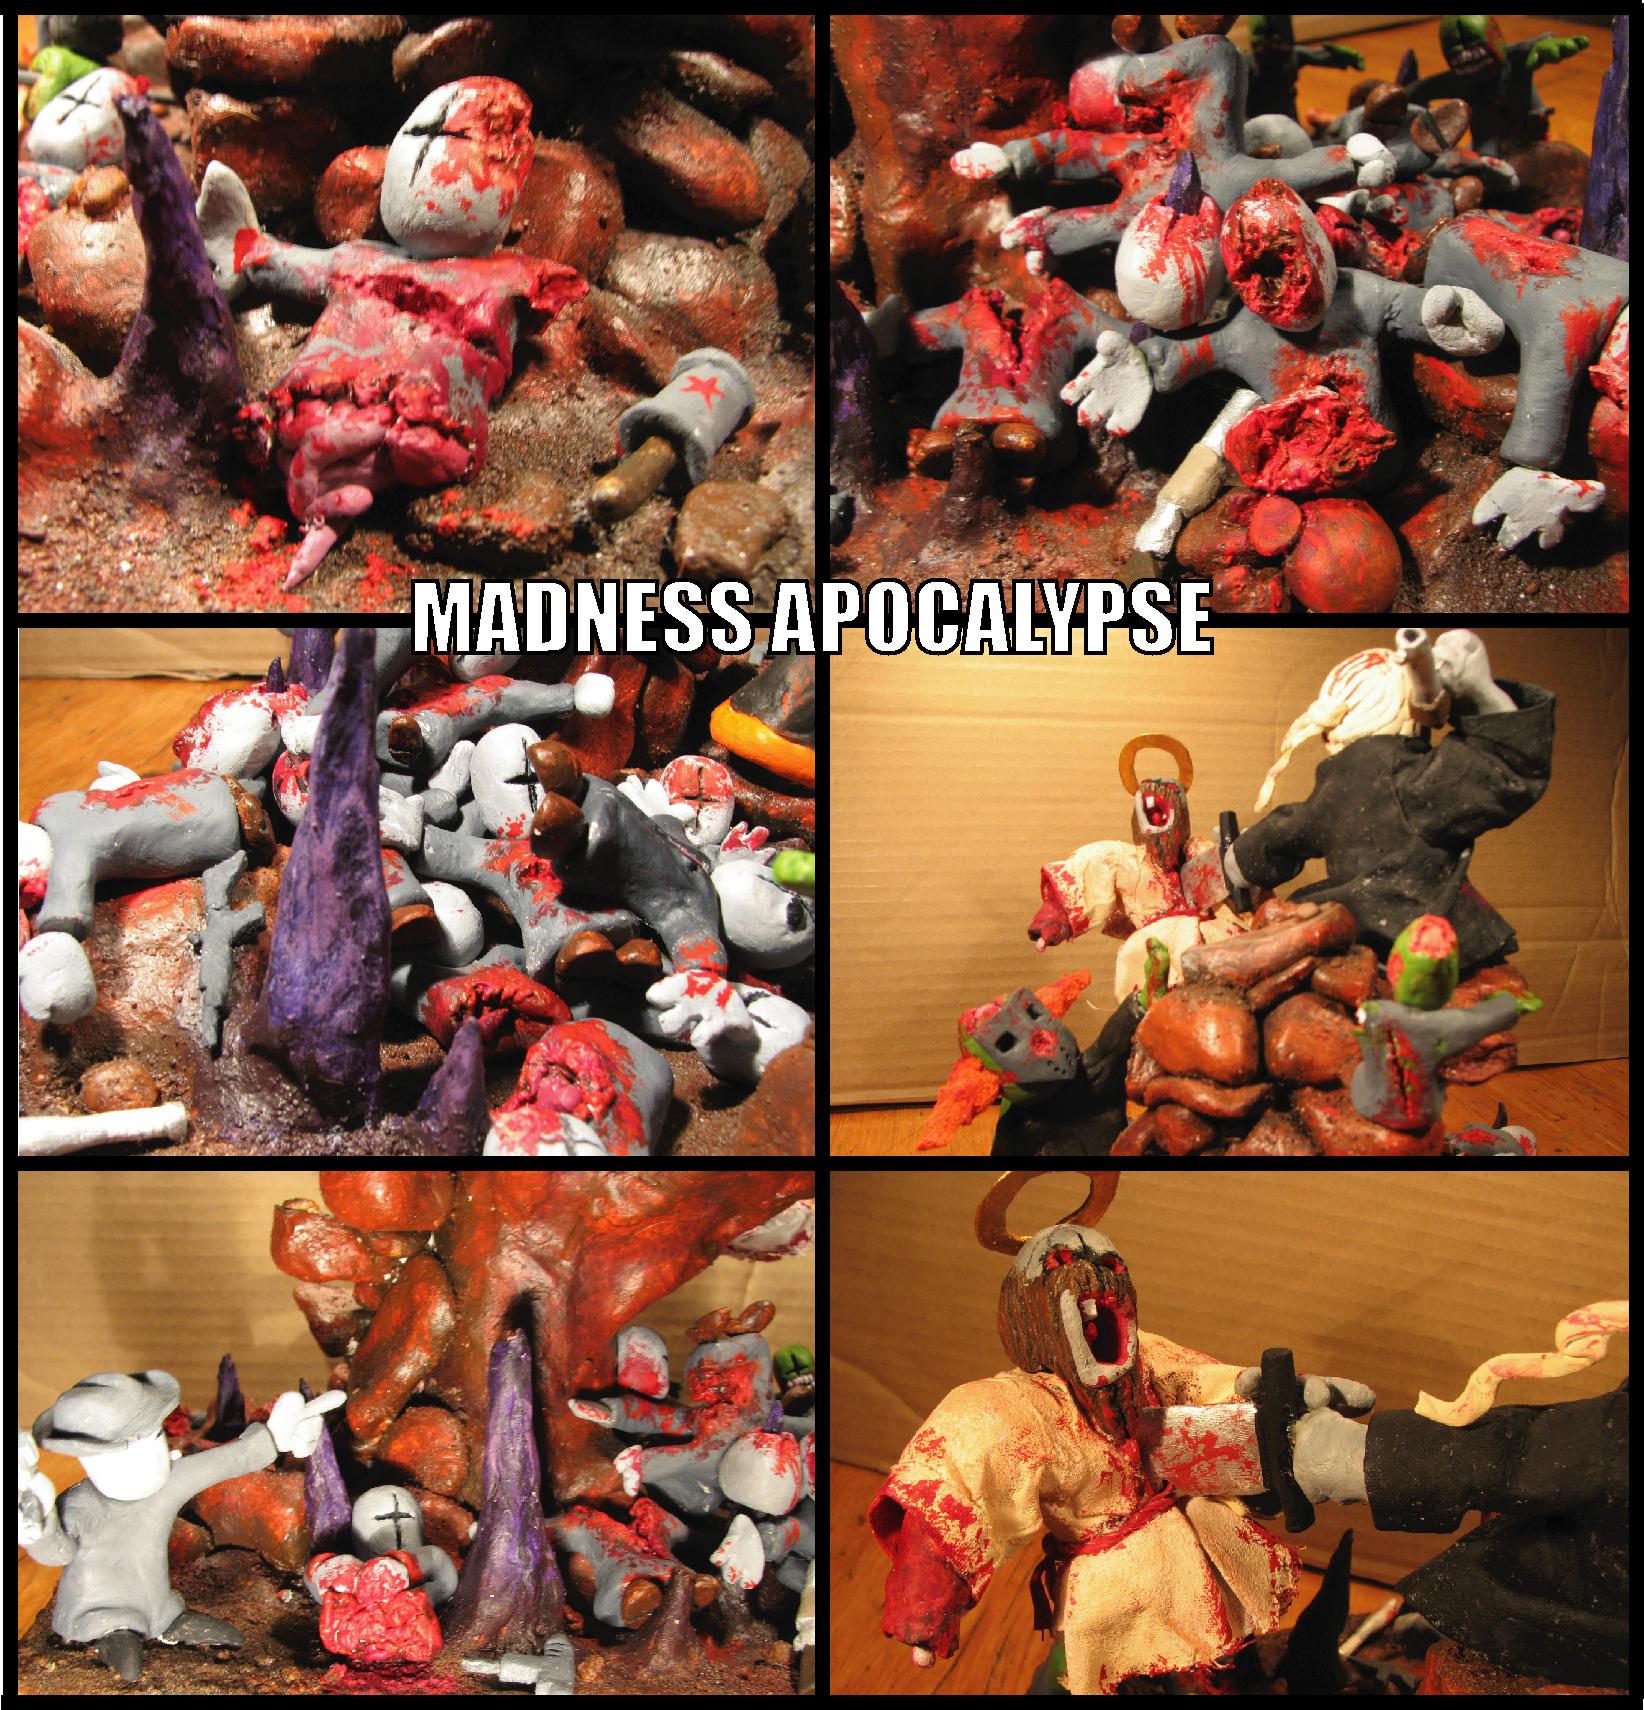 Madness Apocalypse